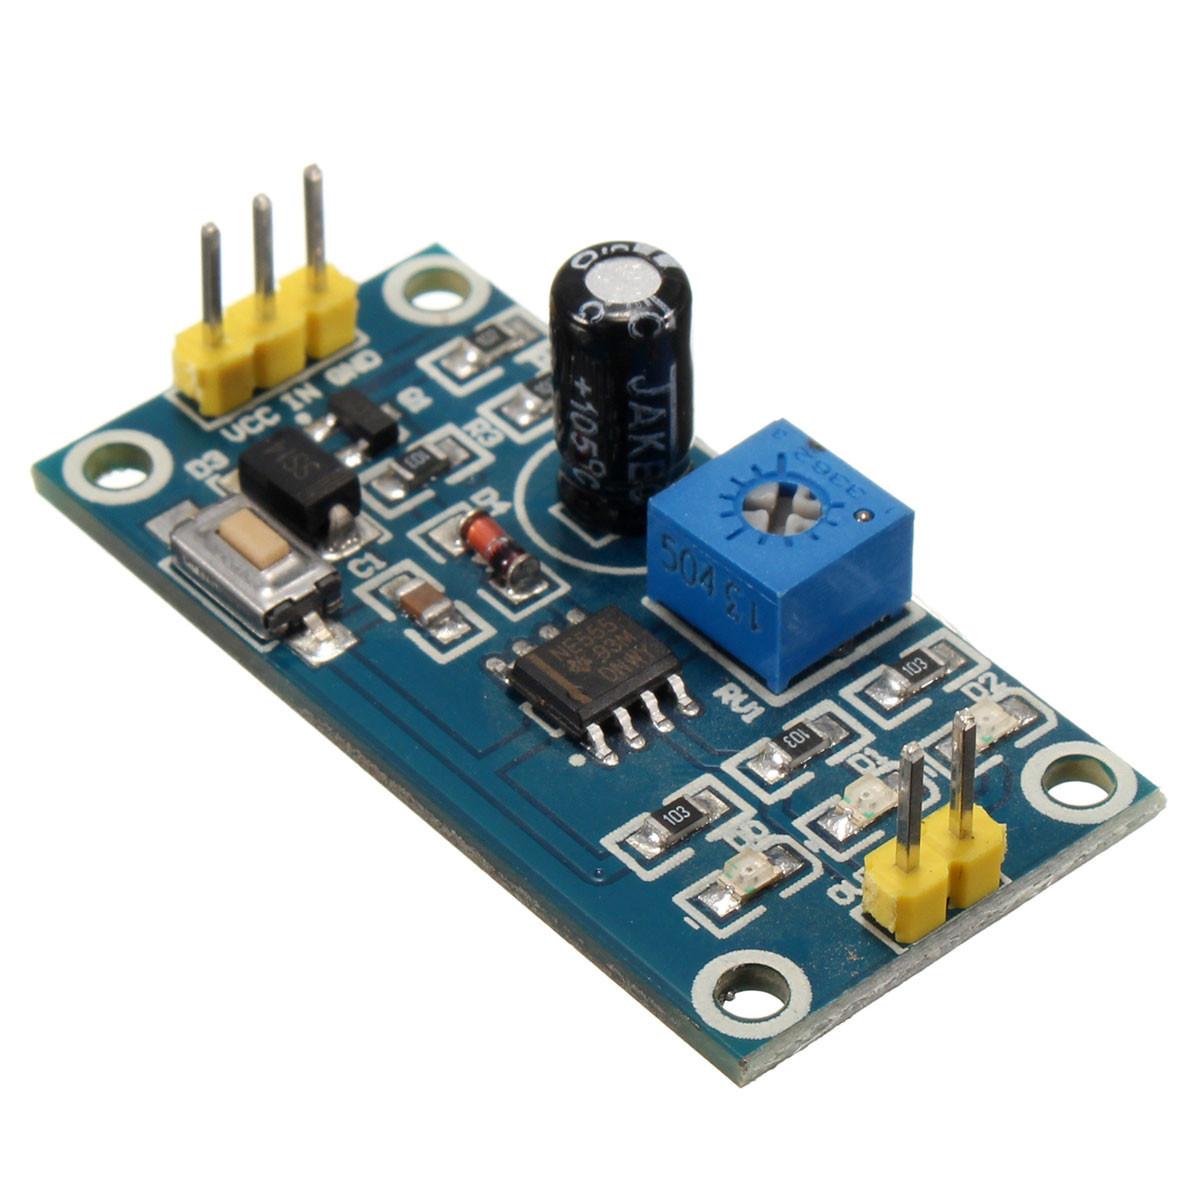 5pcs DC 5-12V Adjustable Delay Timer Switch NE555 Relay Shield Module image 2